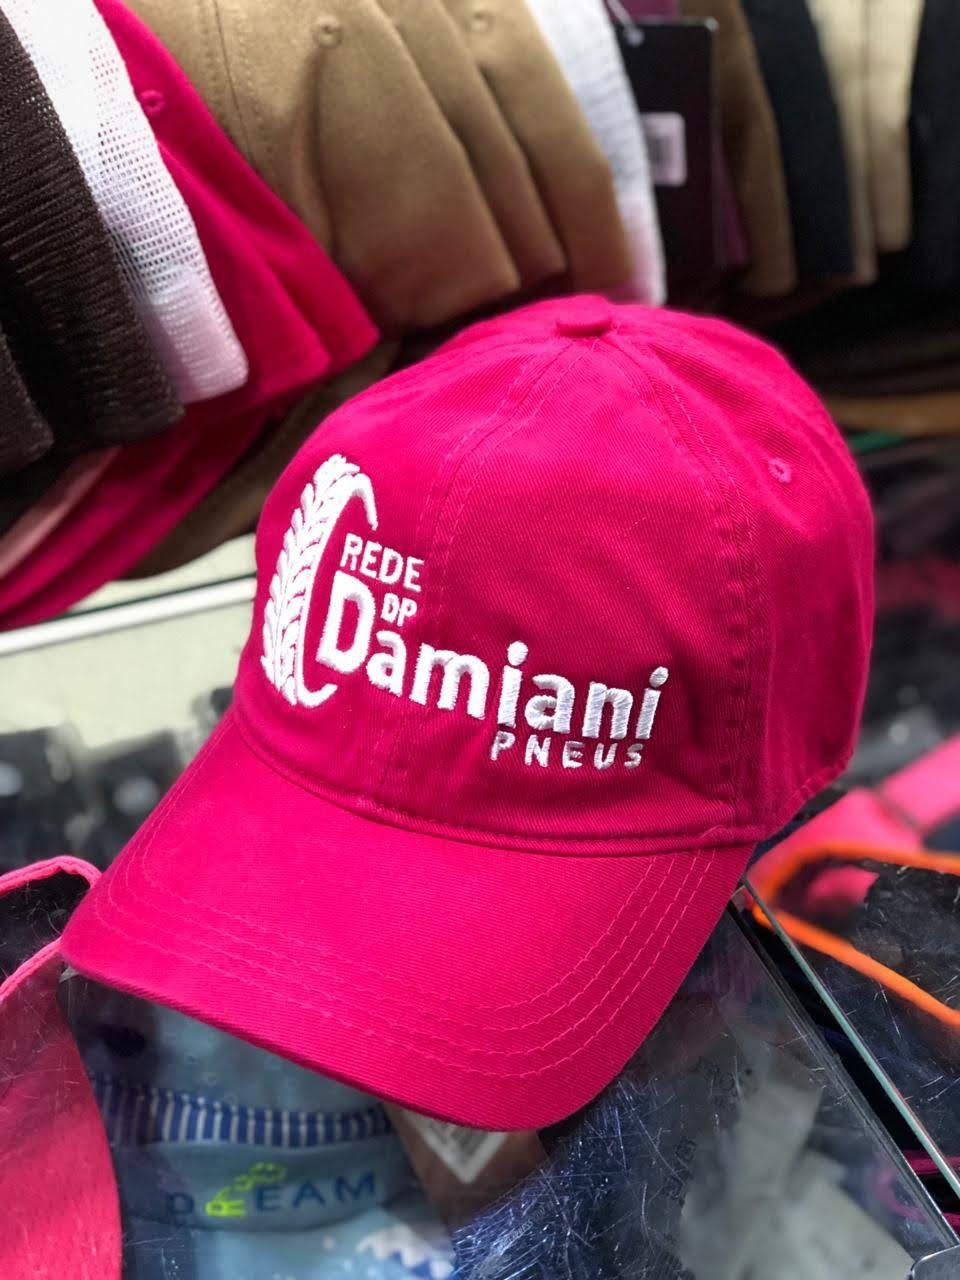 damiani_pneus_bone (17)